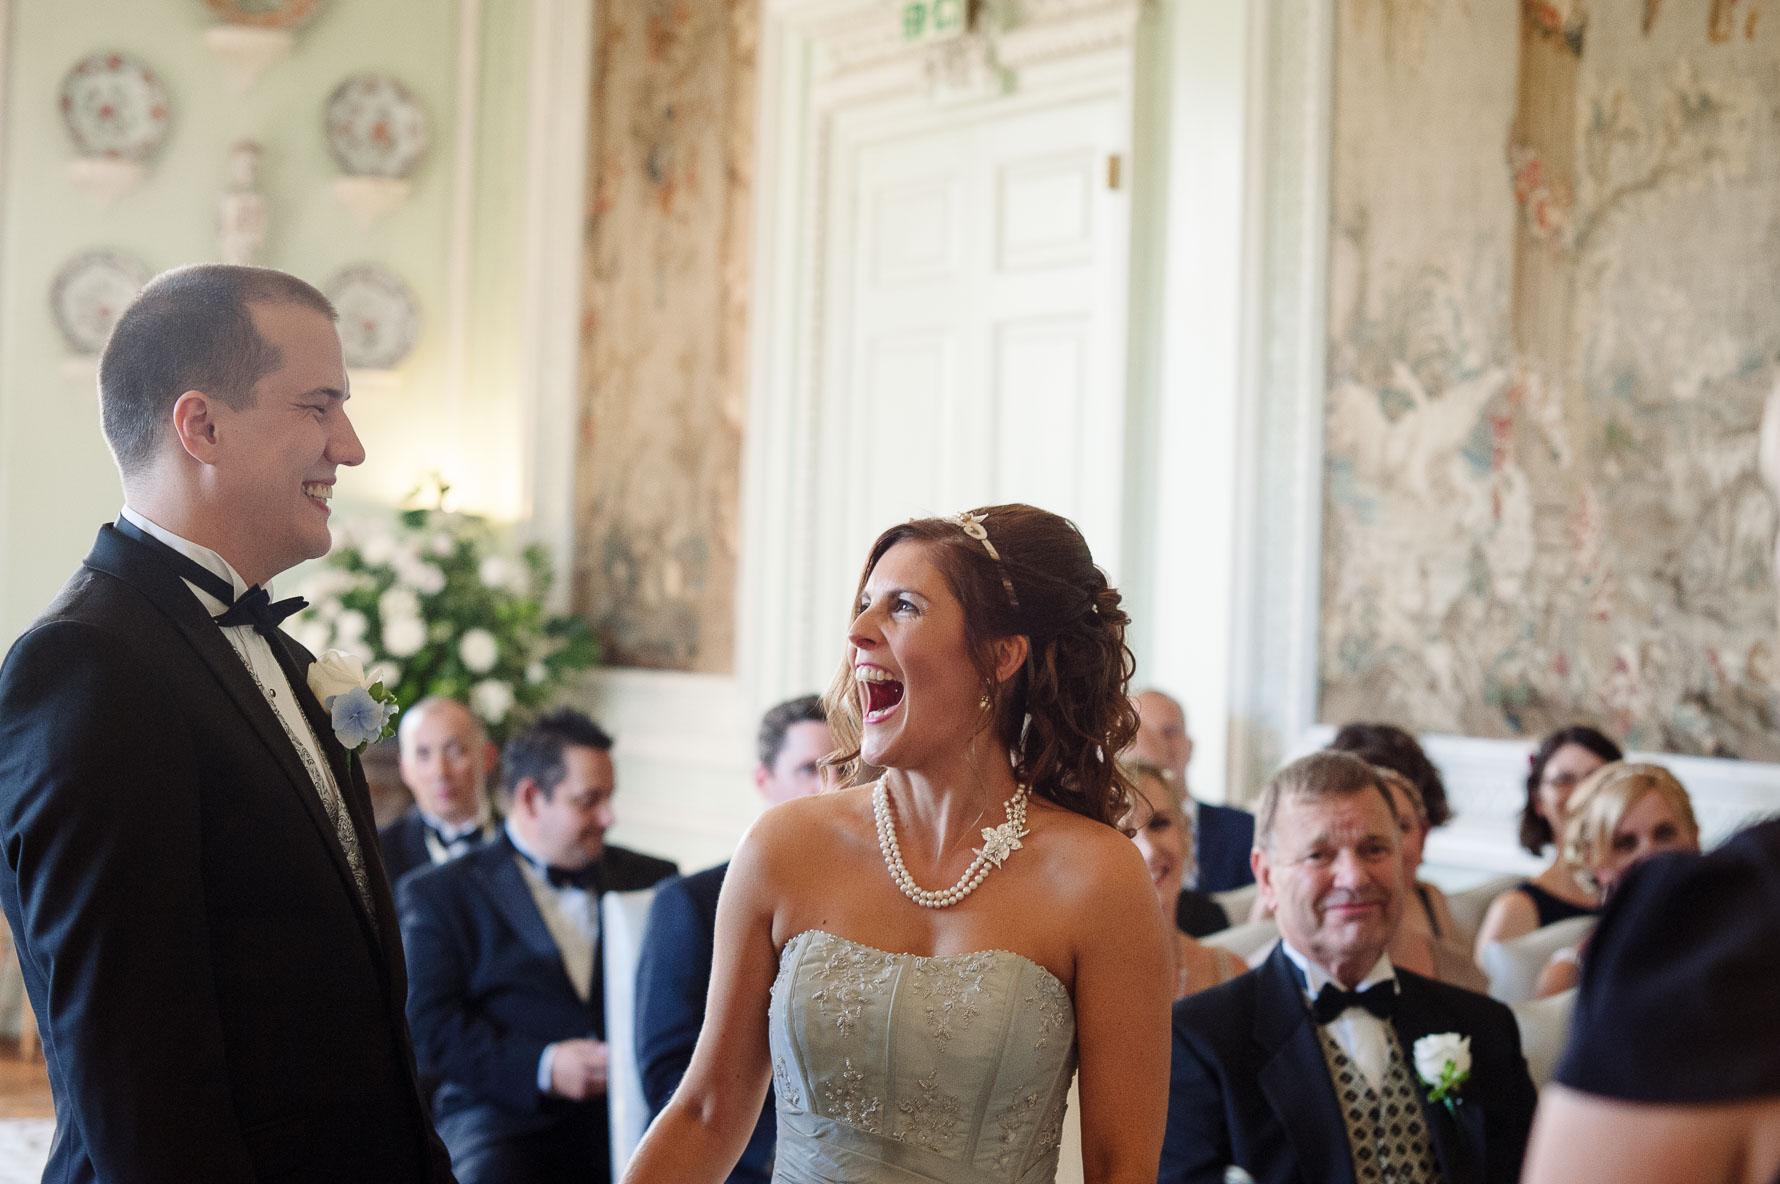 Leeds Castle Wedding17-20140919 0581